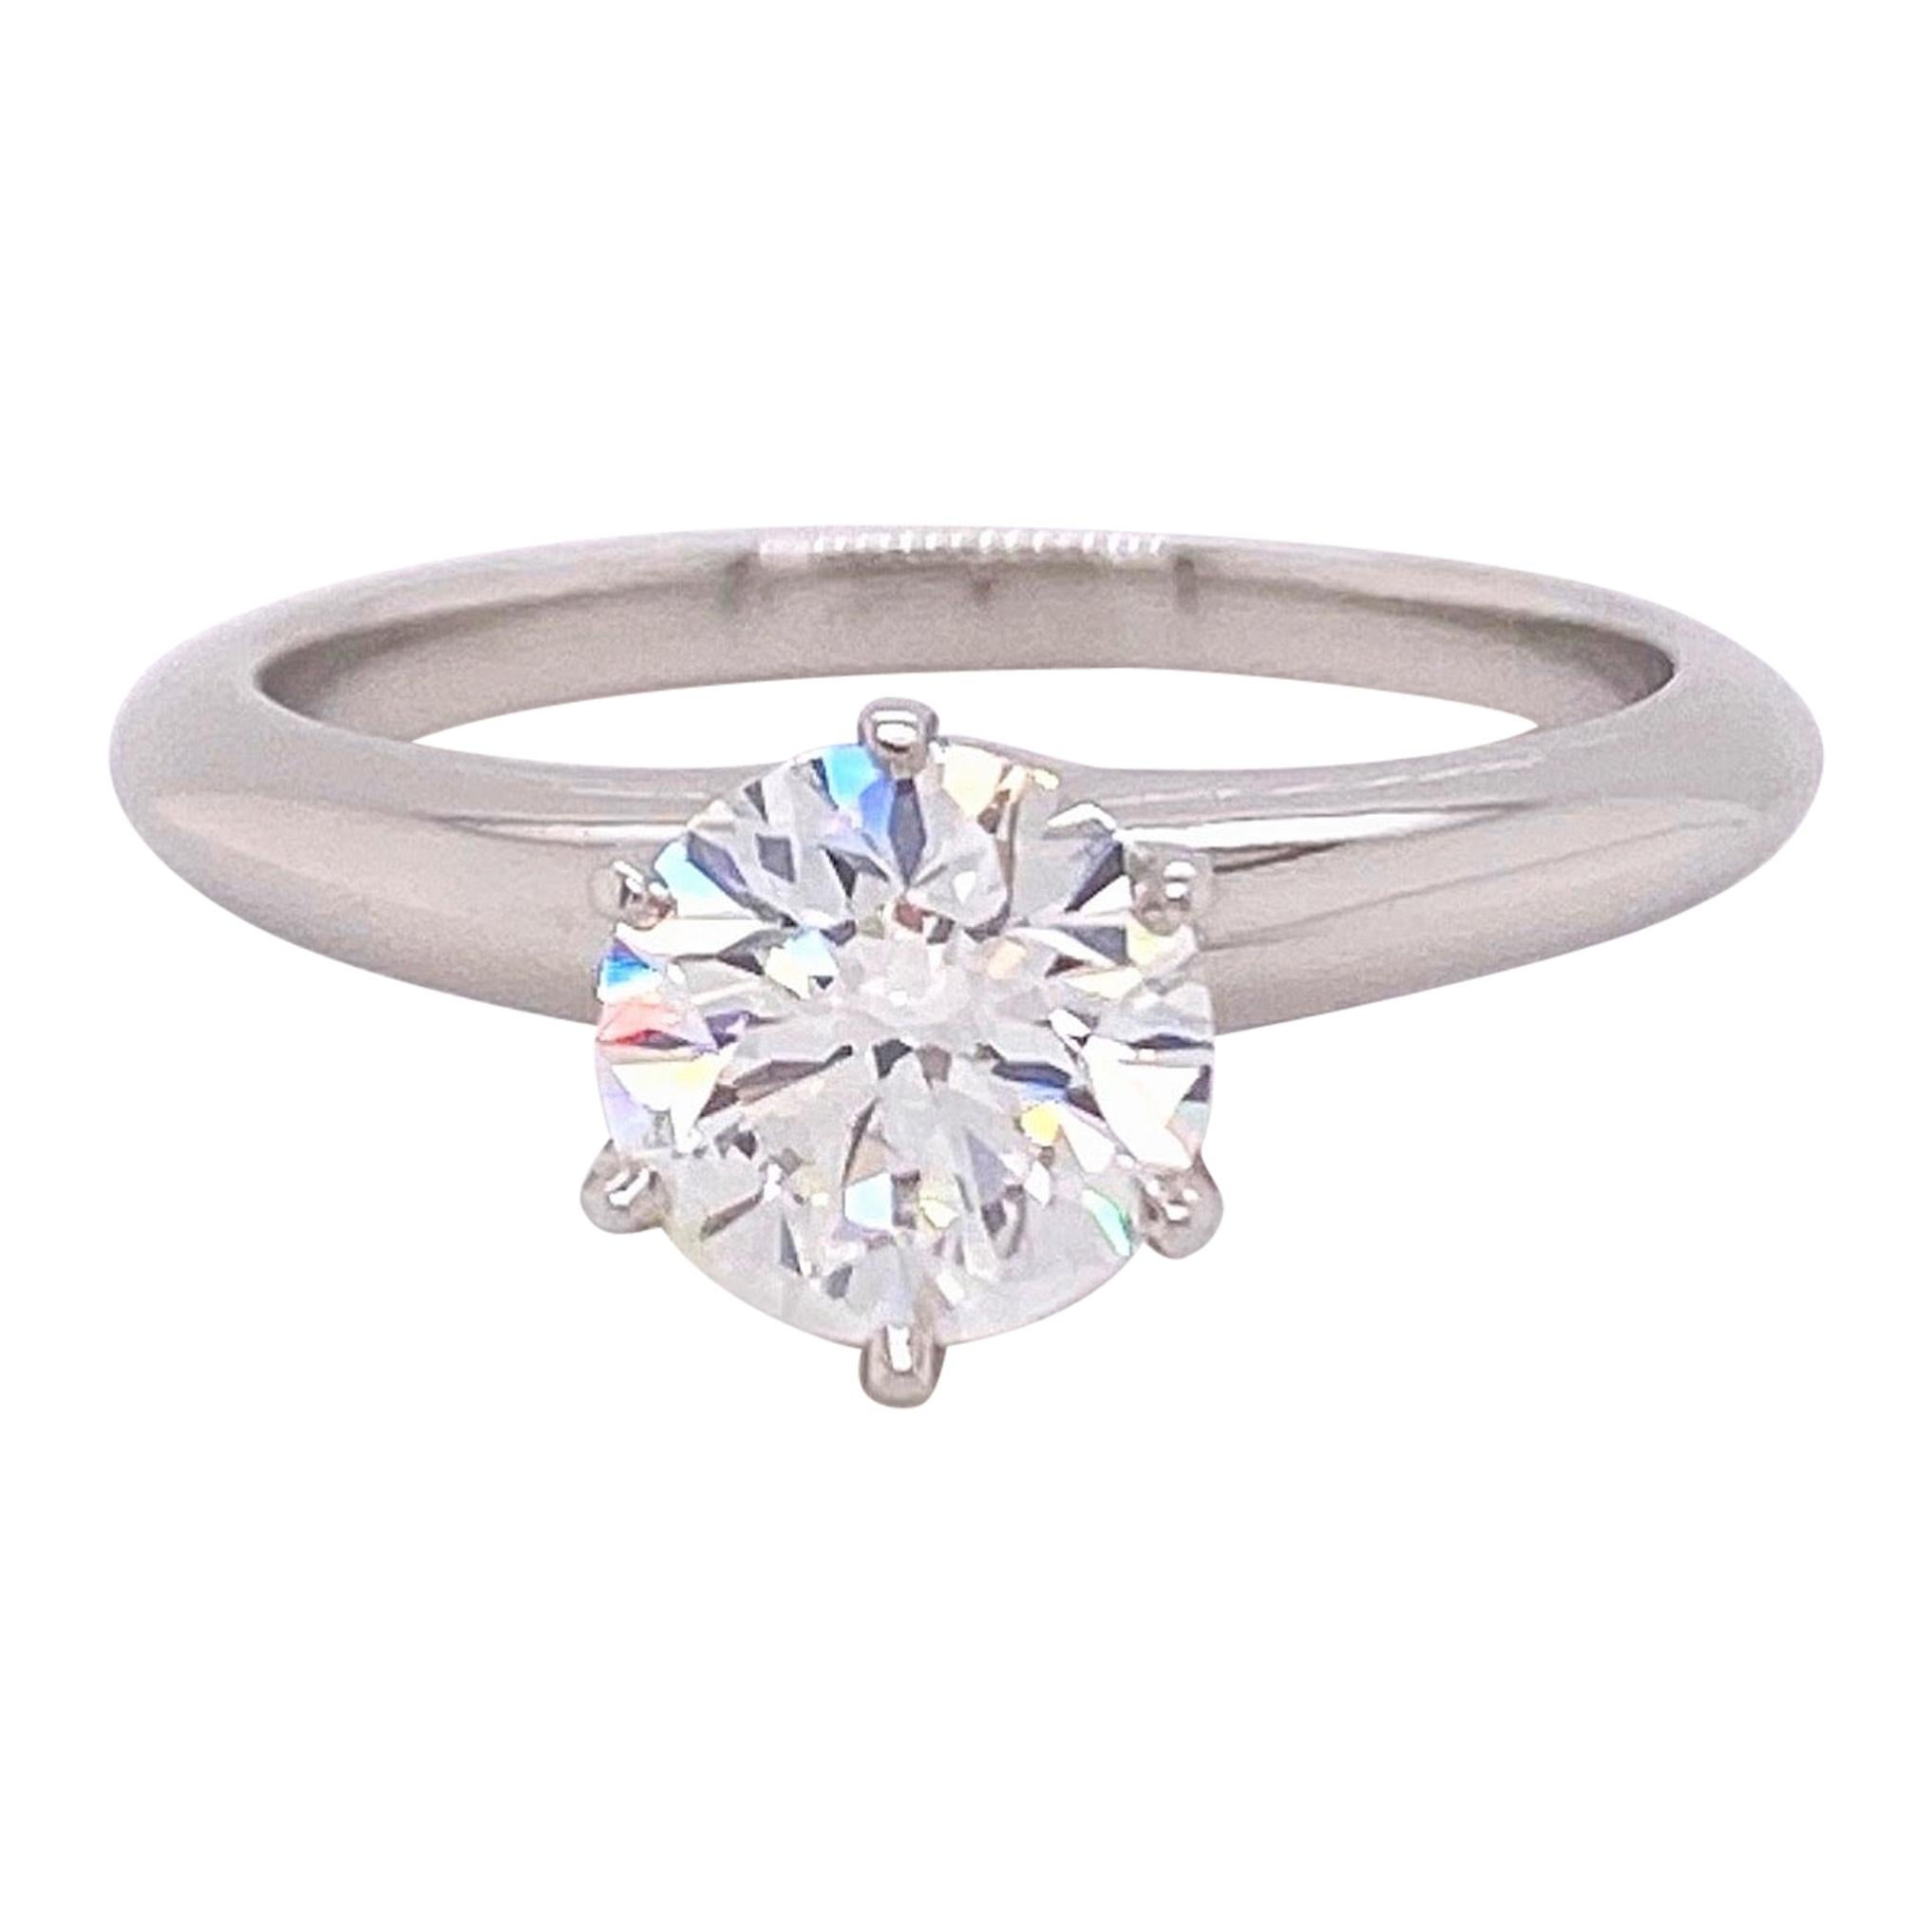 Tiffany & Co. Round Diamond 1.03 Carat G VS1 Solitaire Ring in Platinum